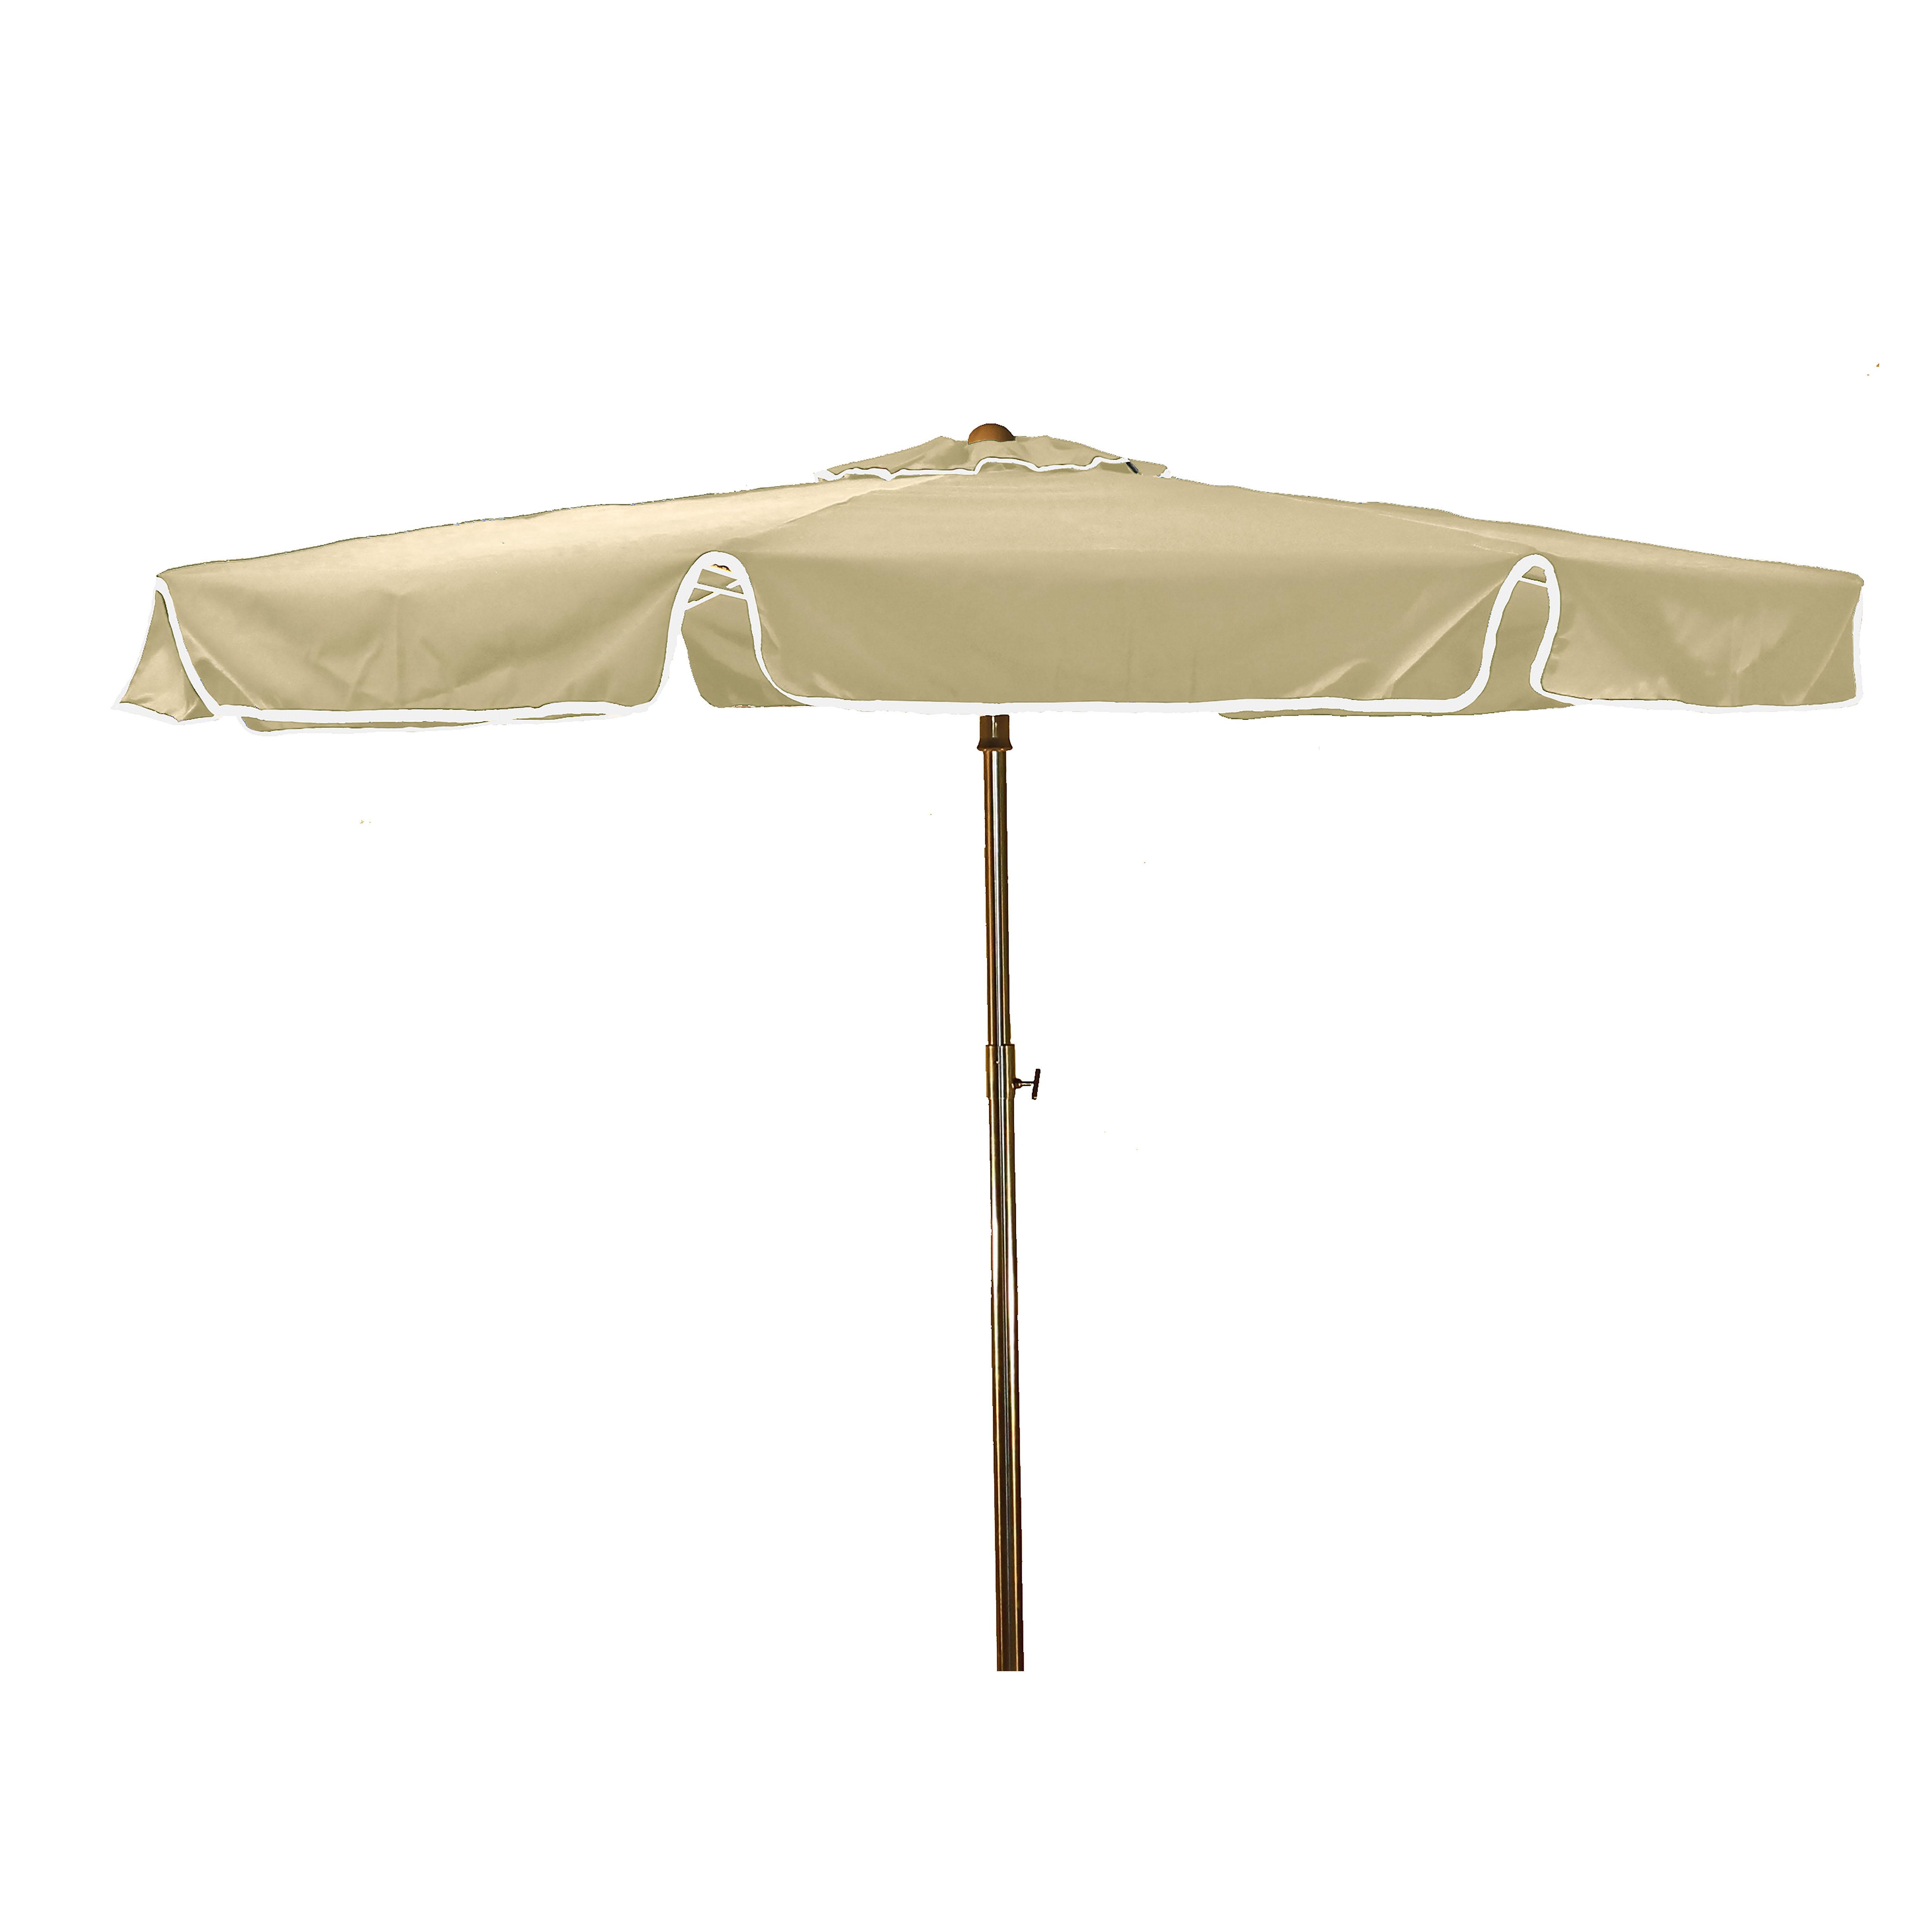 Grosfillex 98122831 umbrella